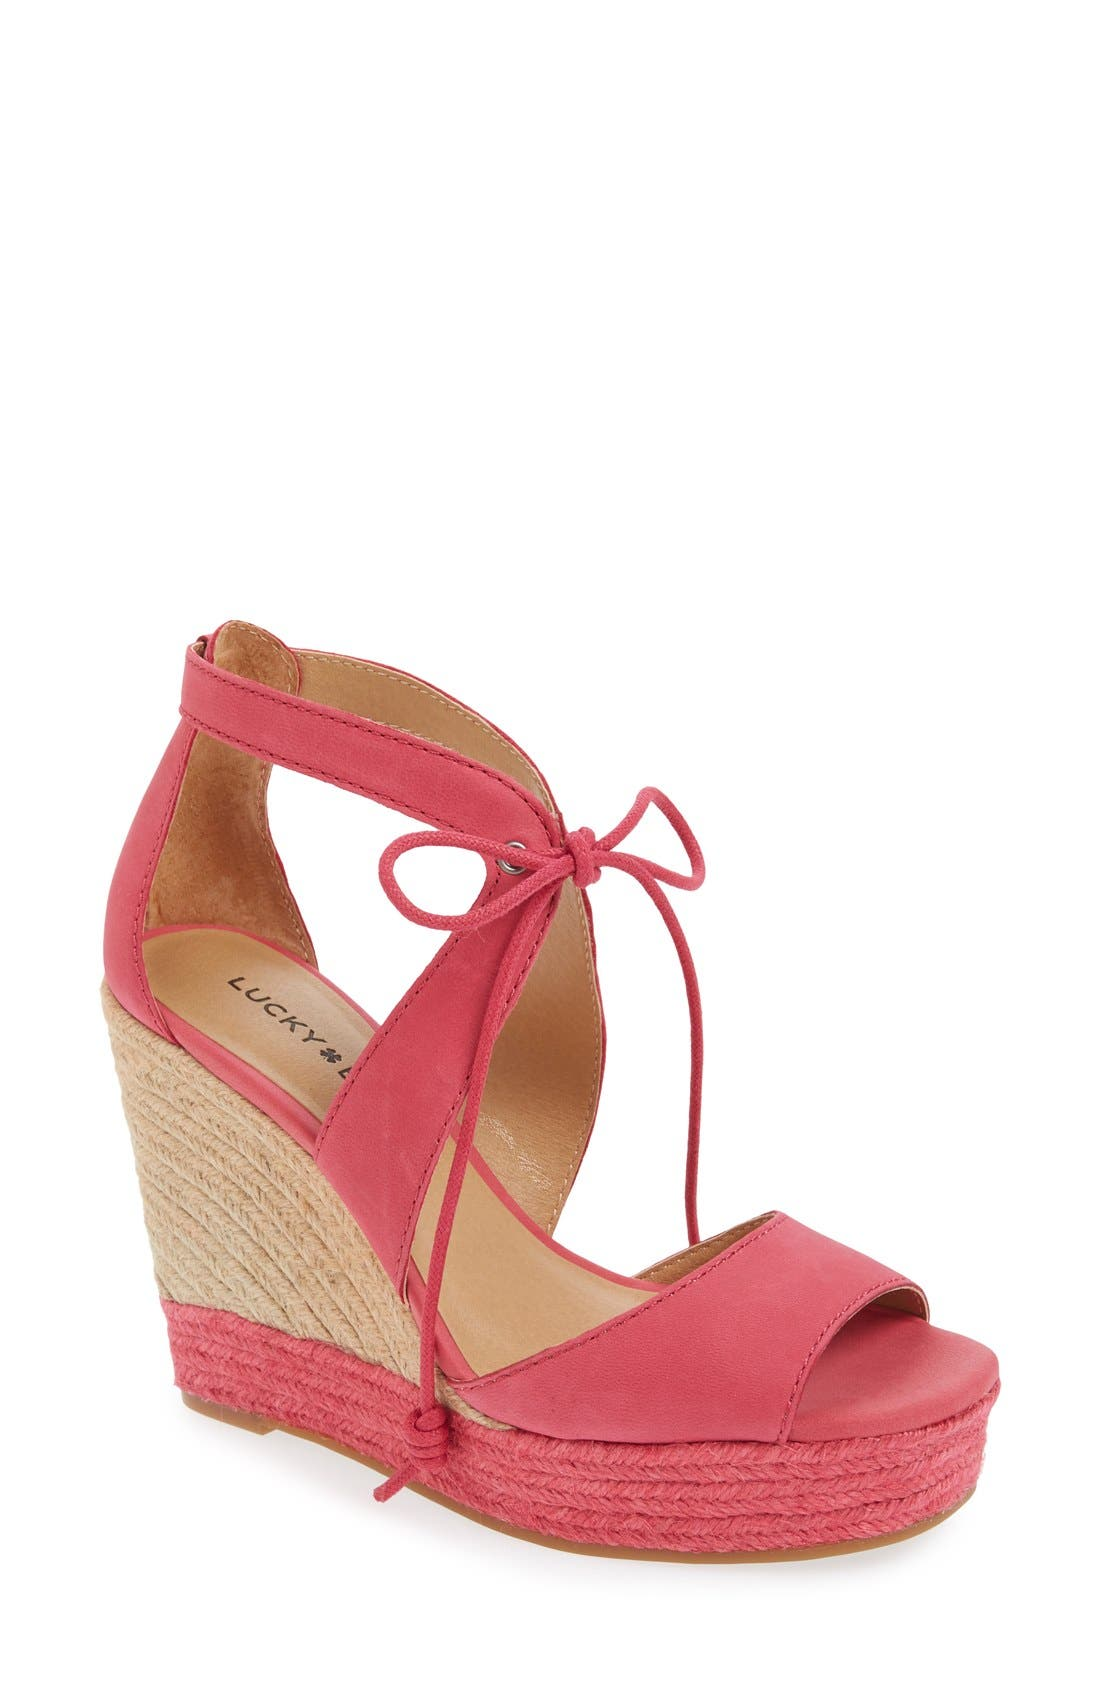 Main Image - Lucky Brand 'Listalia' Sandal (Women)